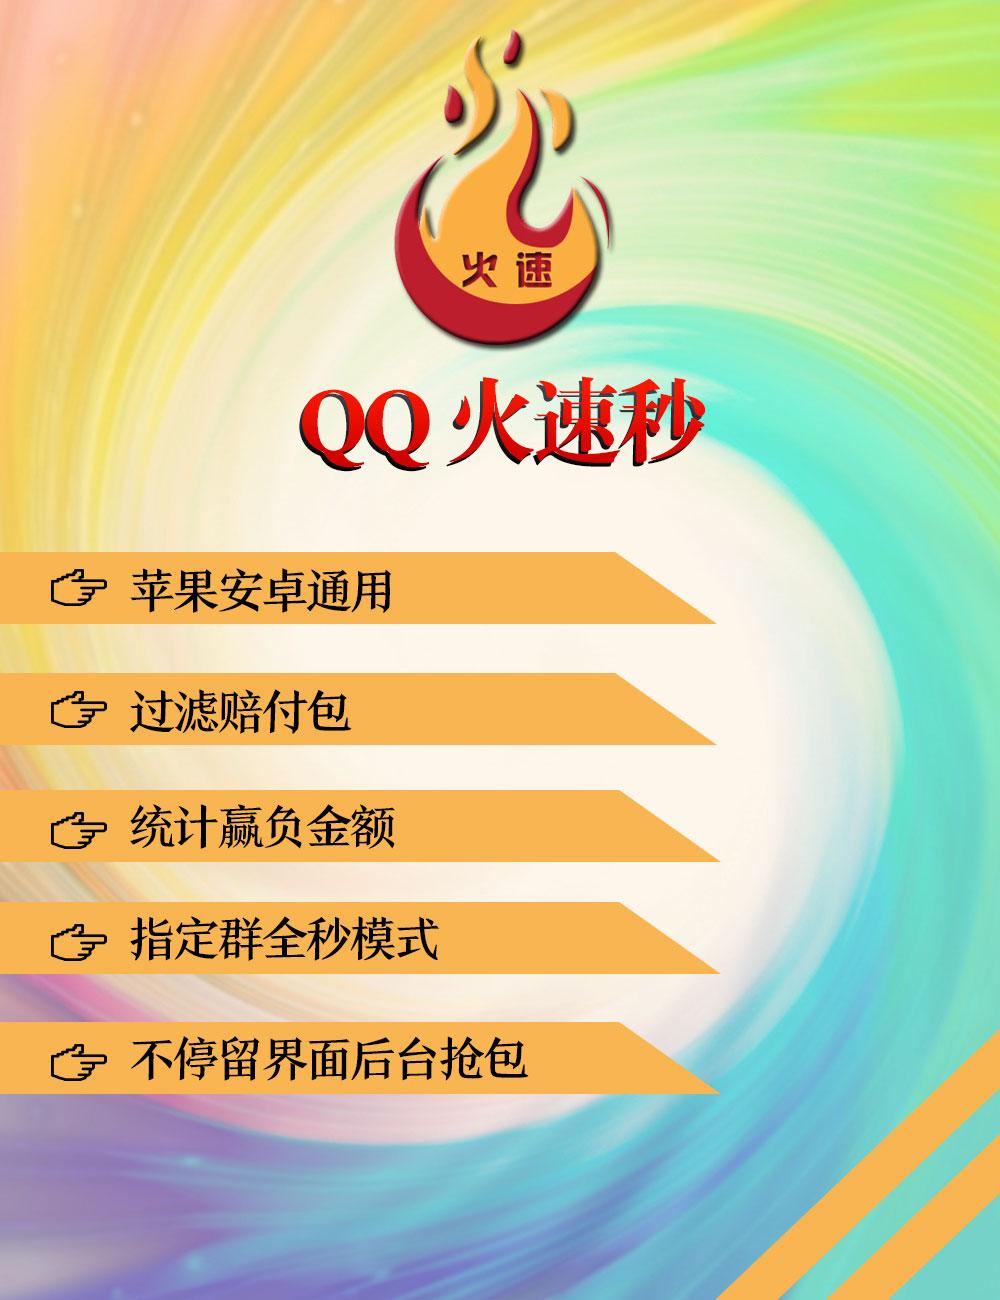 【QQ火速秒】永久卡苹果安卓通用一开关联8个号QQ秒抢红包